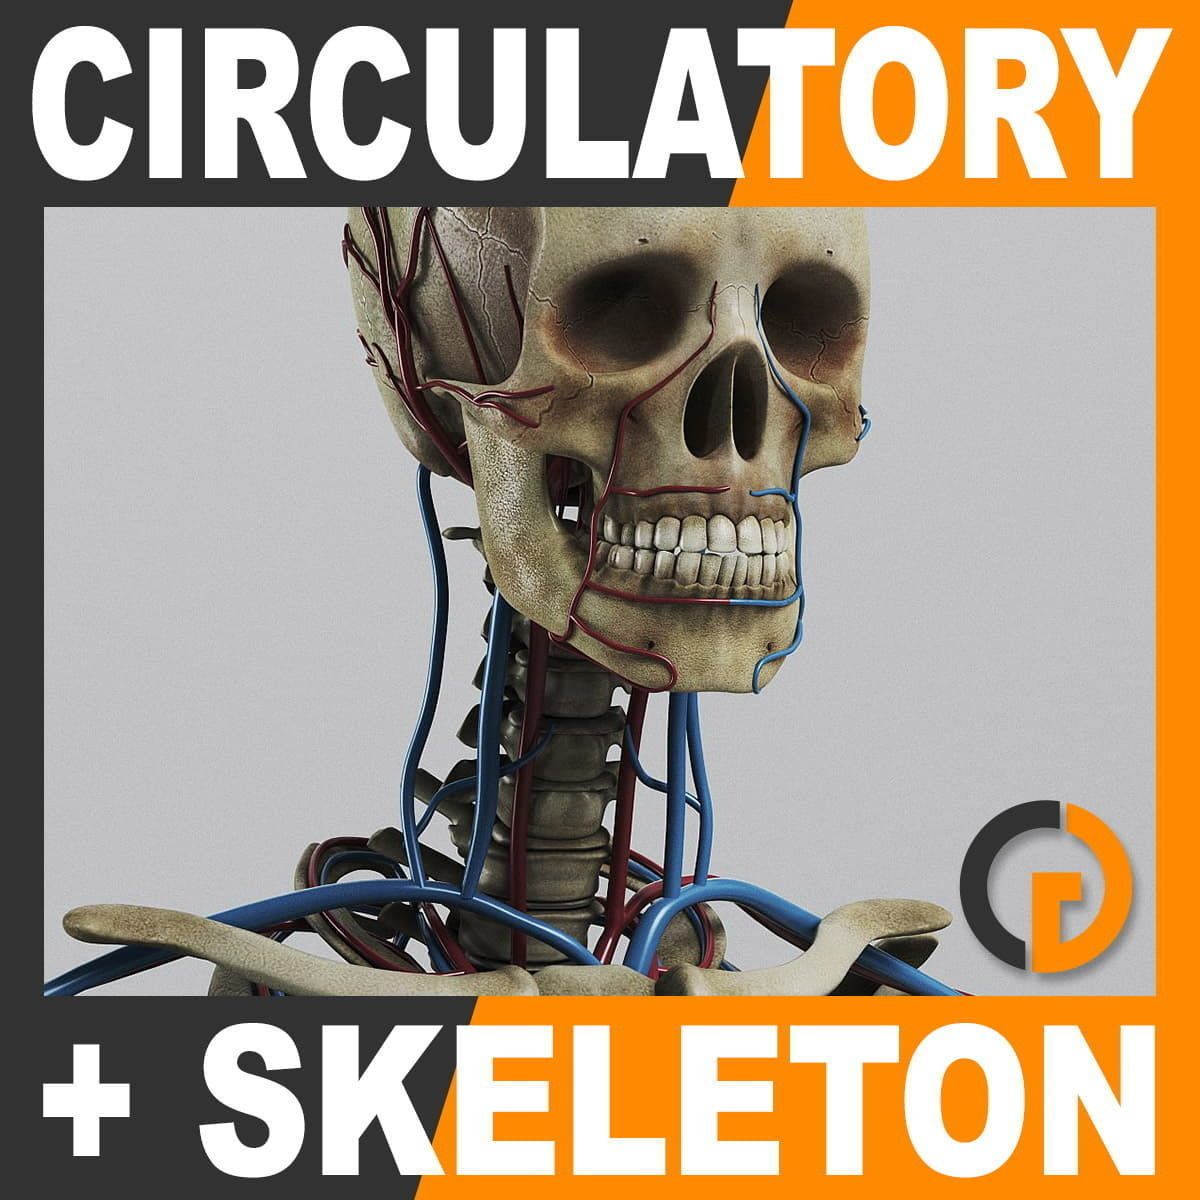 Human Circulatory System and Skeleton - Anatomy